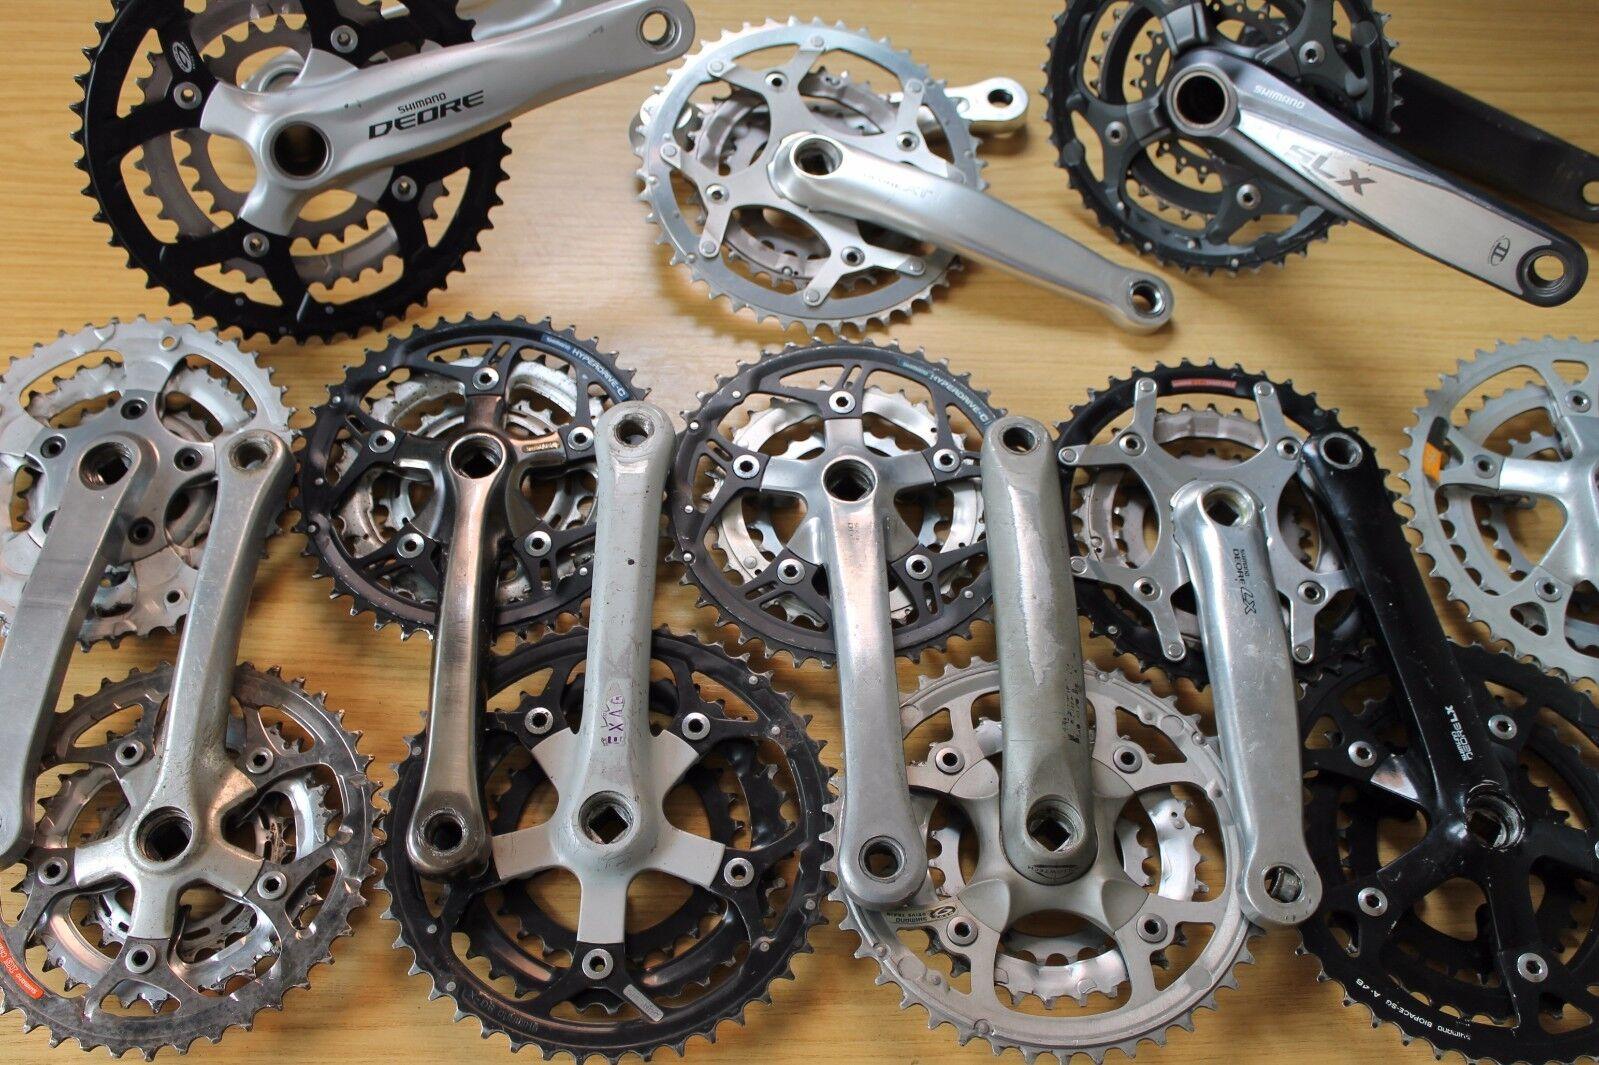 Shimano Chainset Crankset Crank Arms Set Retro Choice Triple W Rings XT Deore..